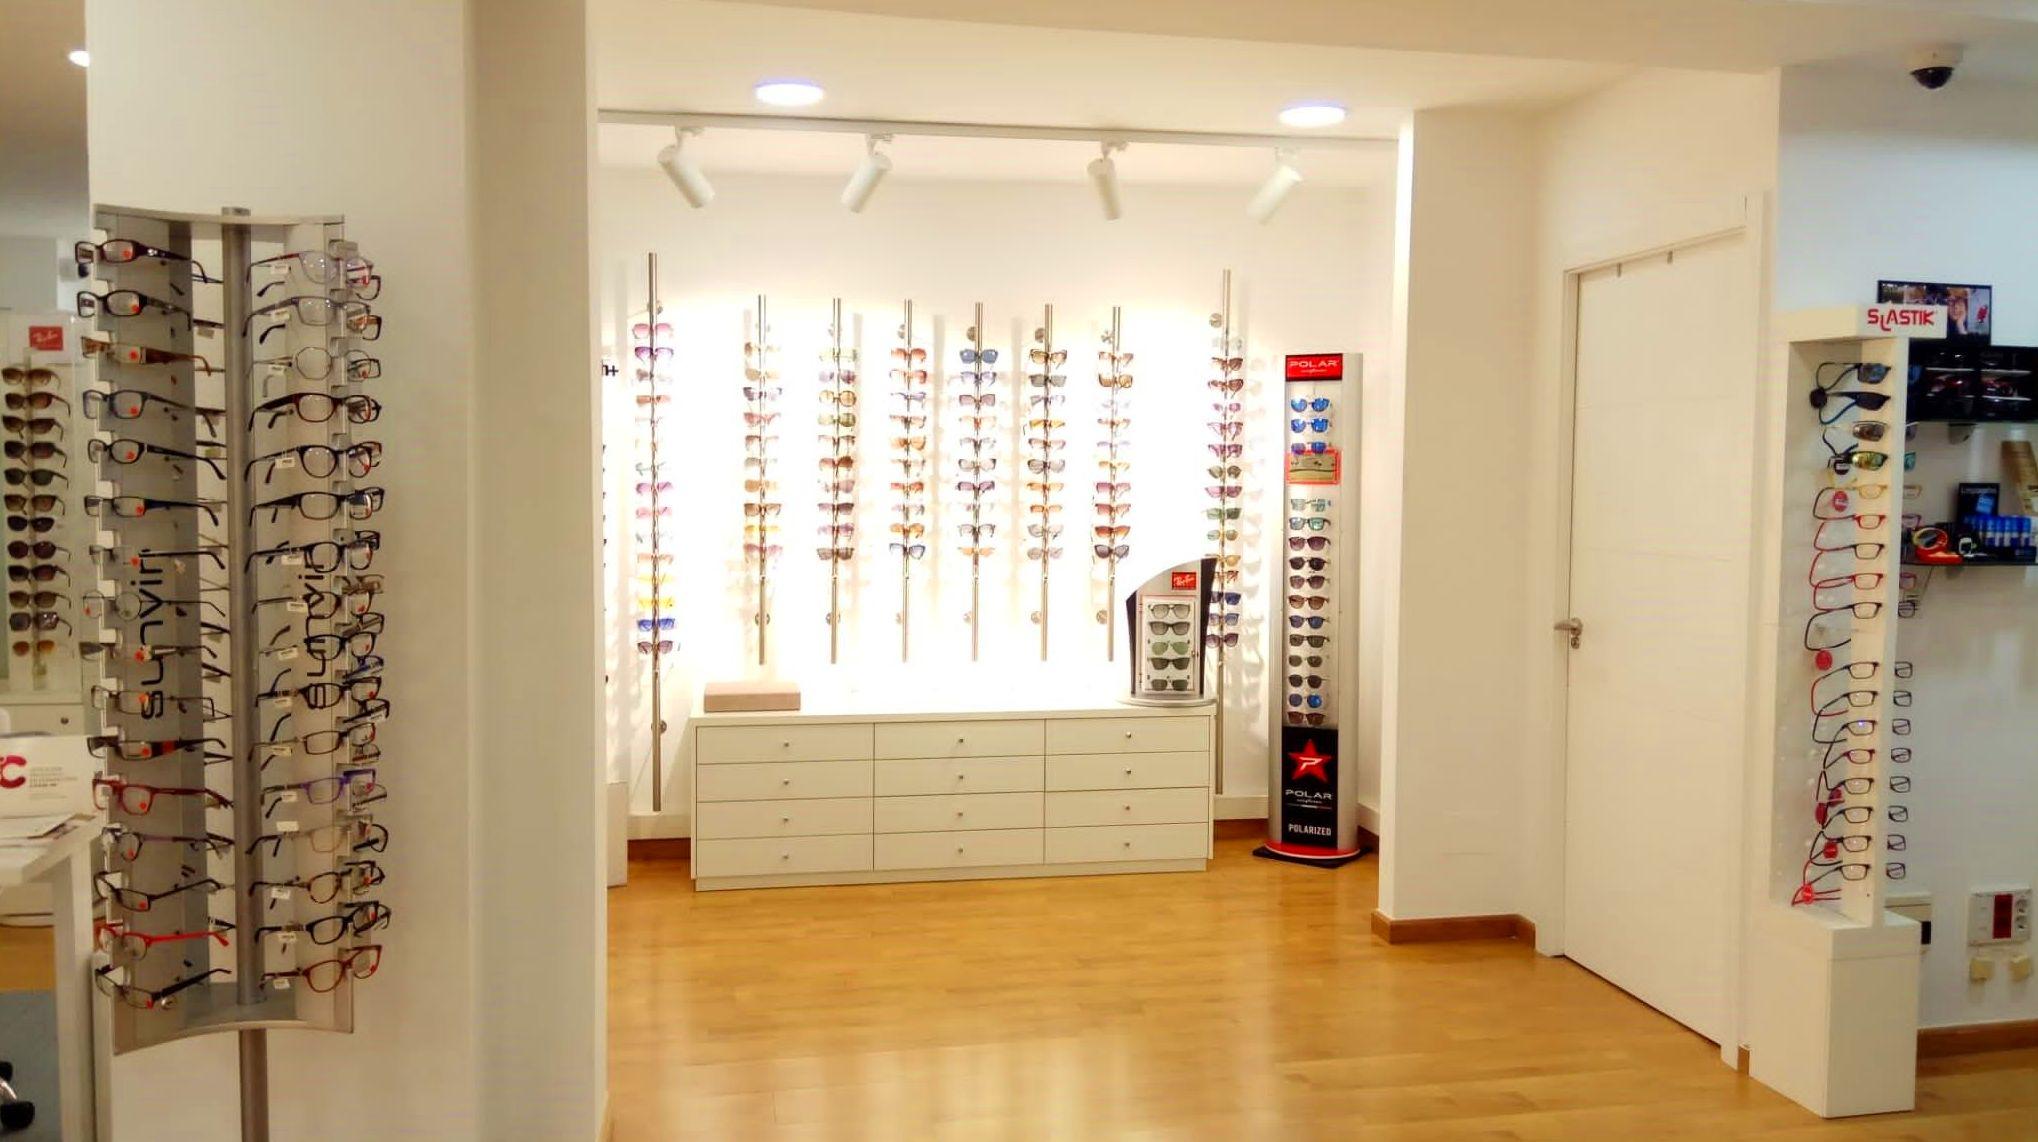 Foto 5 de Ópticas en Vigo | ÓPTICA PRISMALEN             Nº reg. sanitario: E-36-000 230